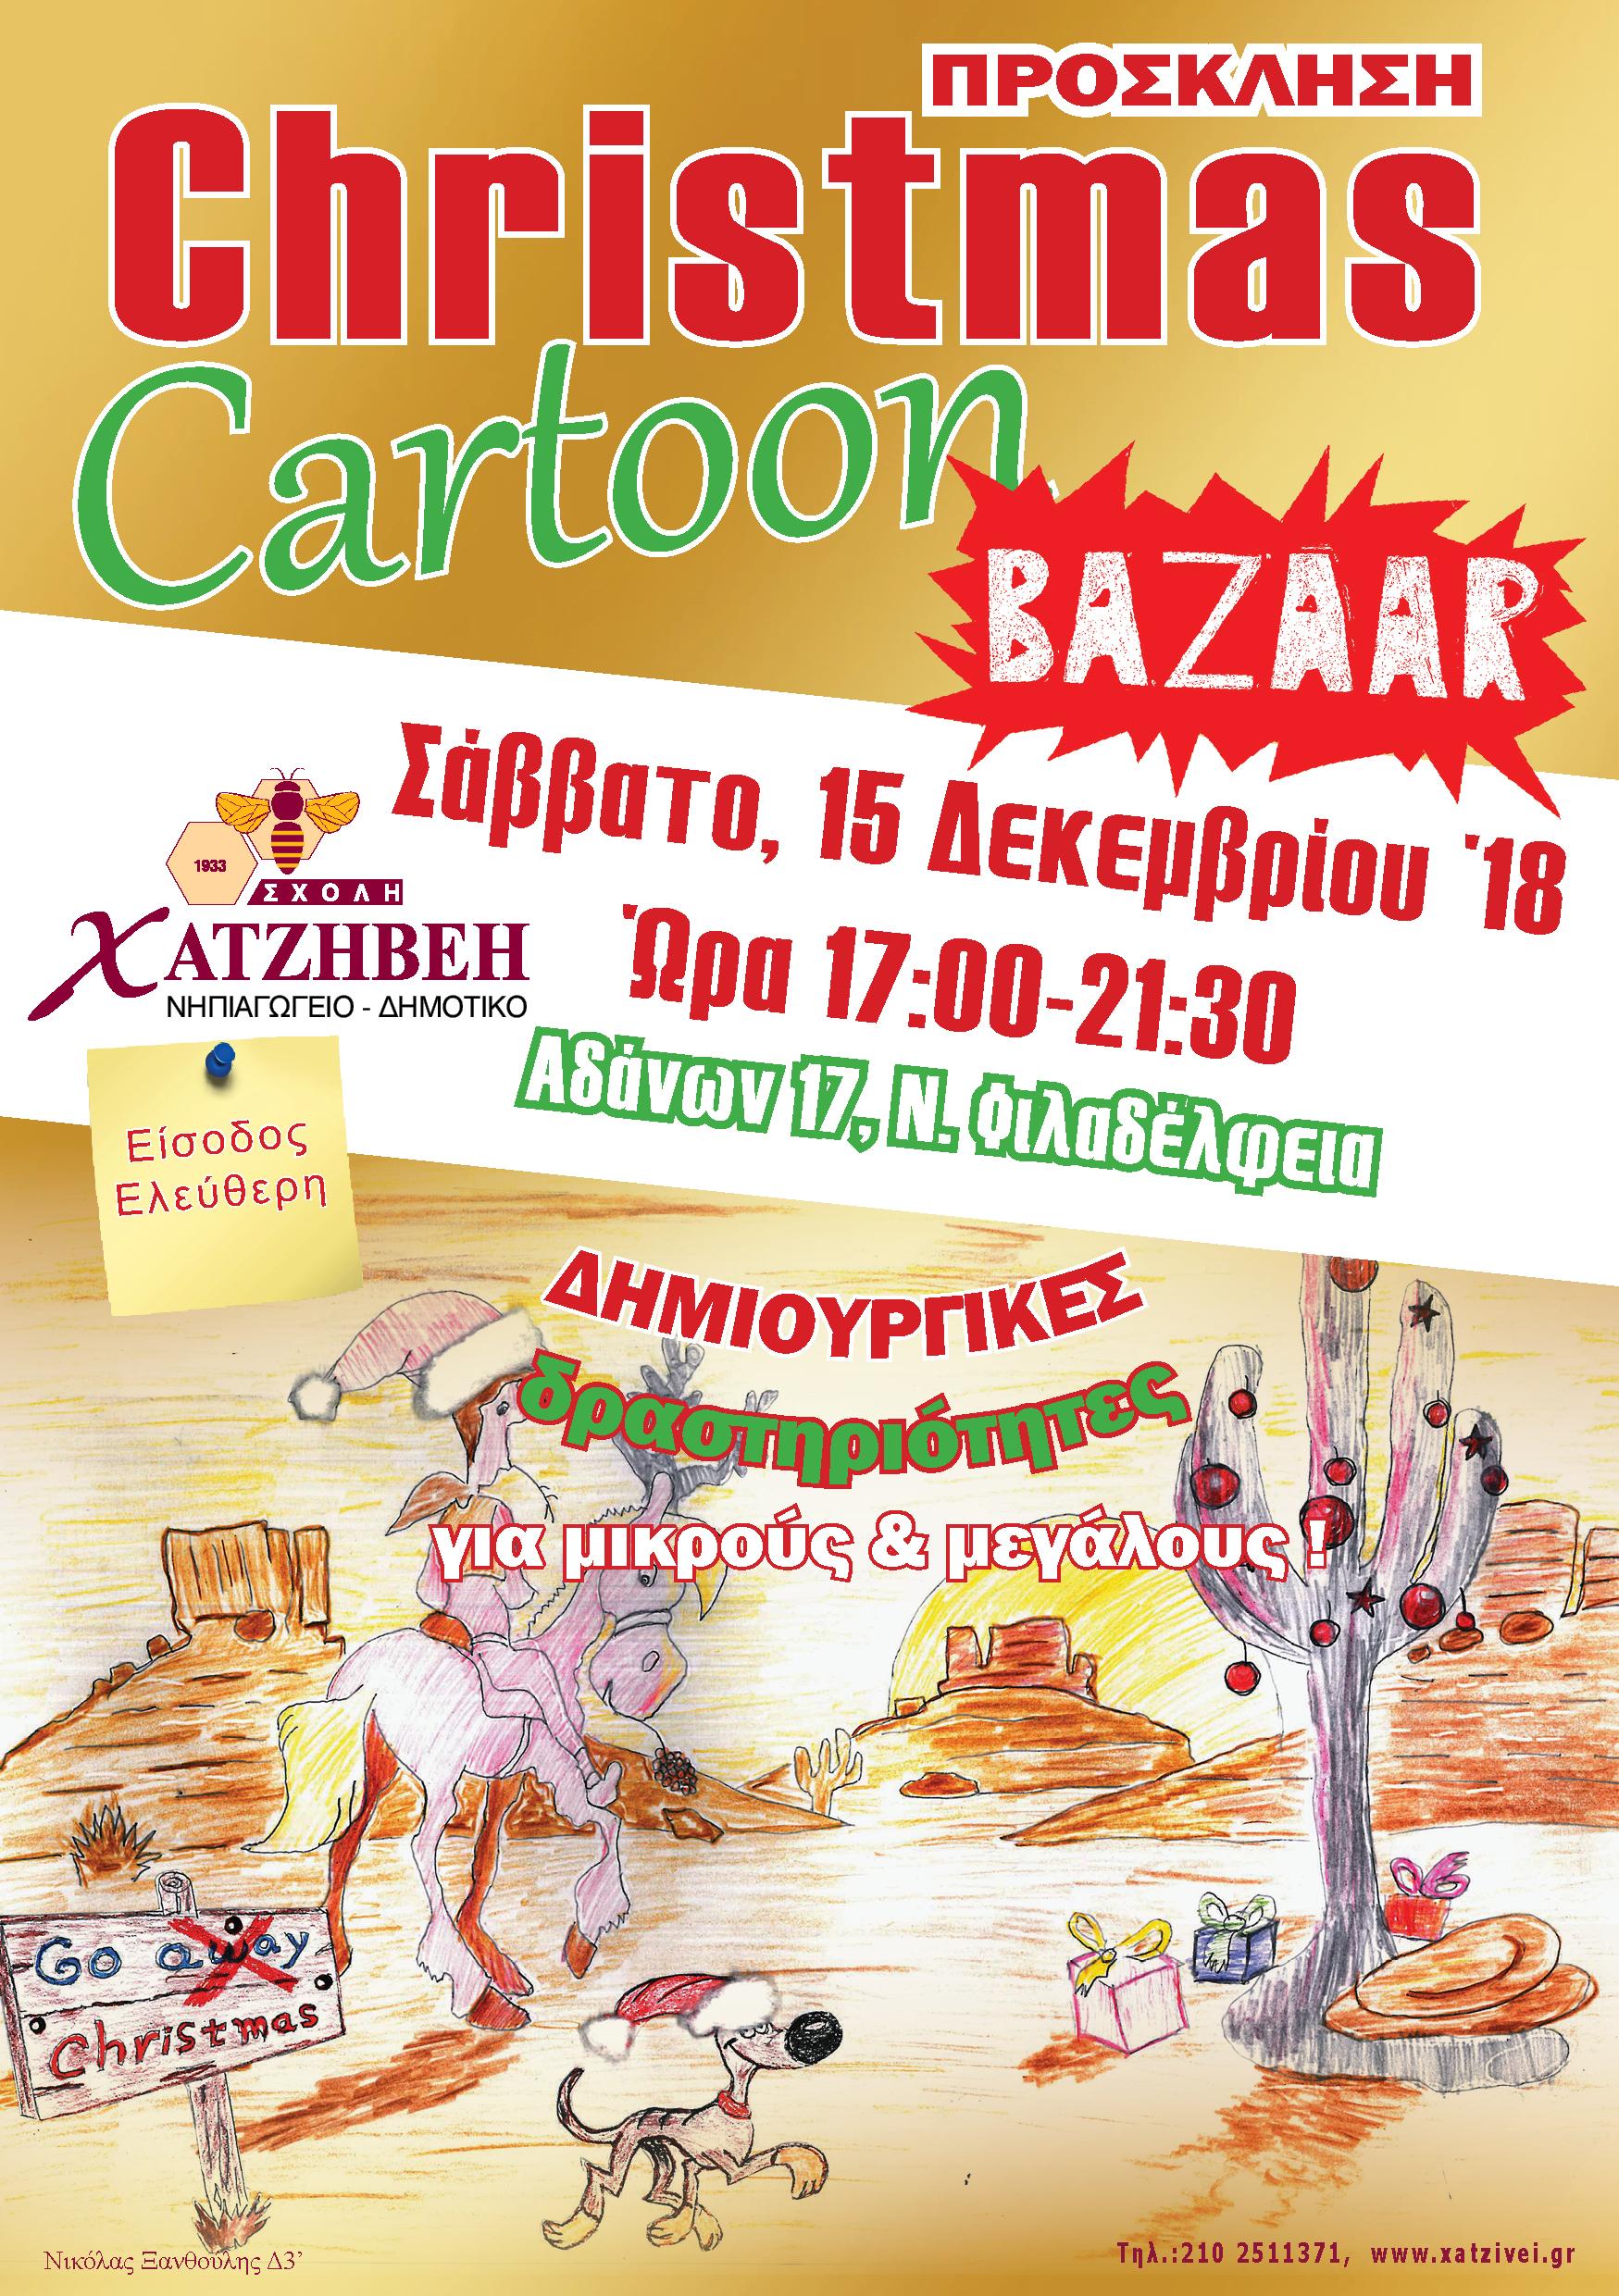 Christmas Cartoon Bazaar - Σχολή Χατζήβεη